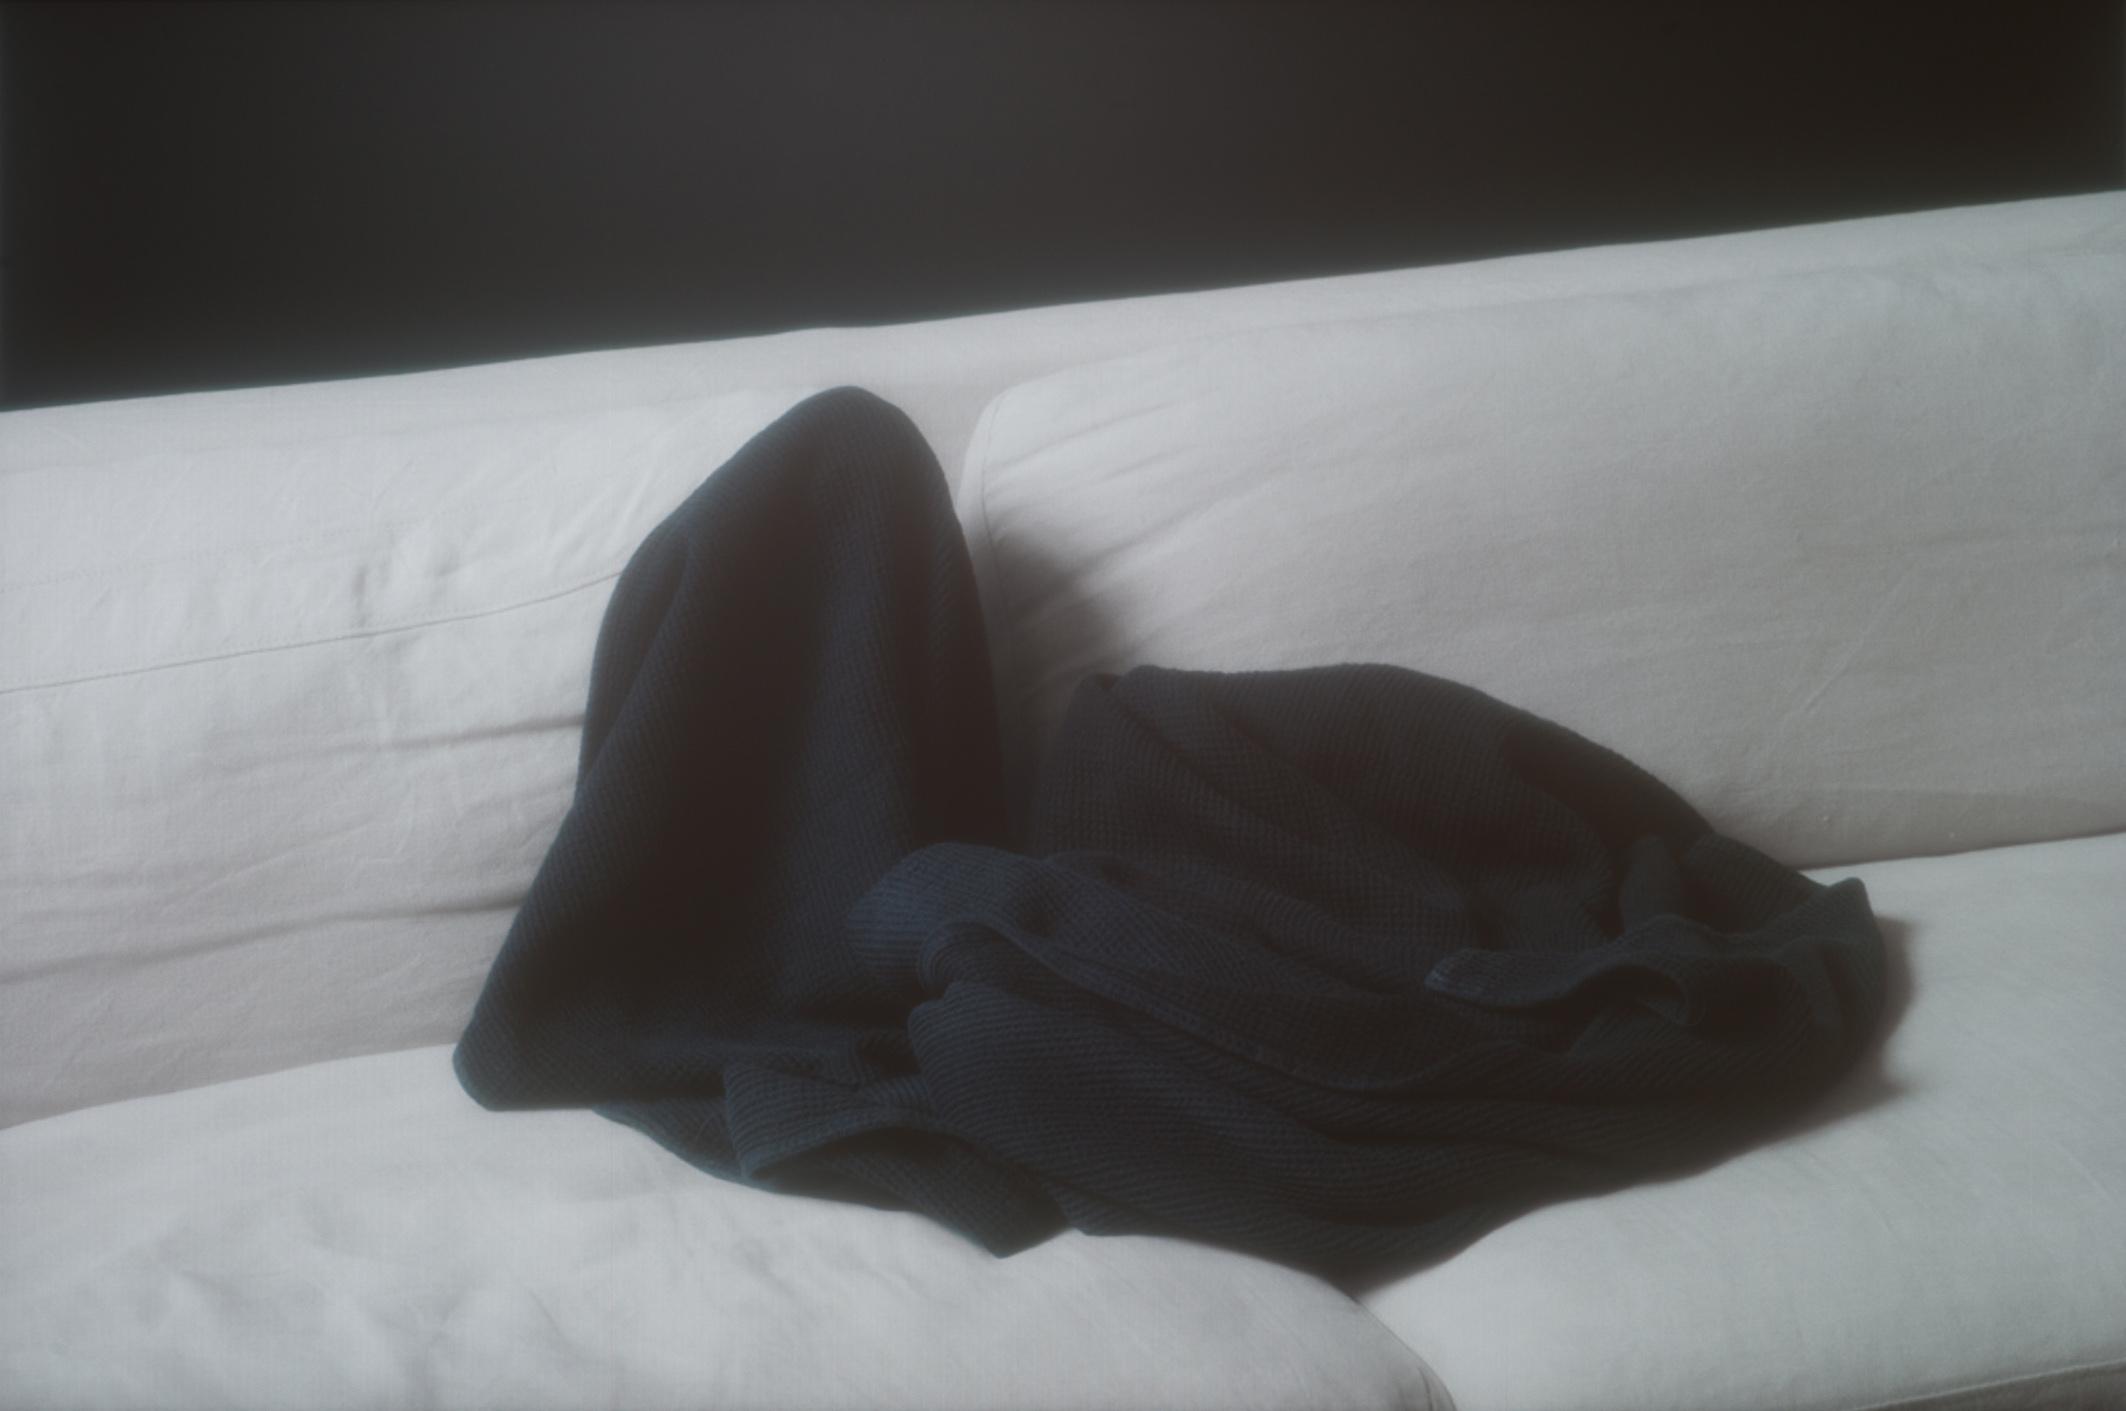 Rorschach test for Hege Storhaug, 2019